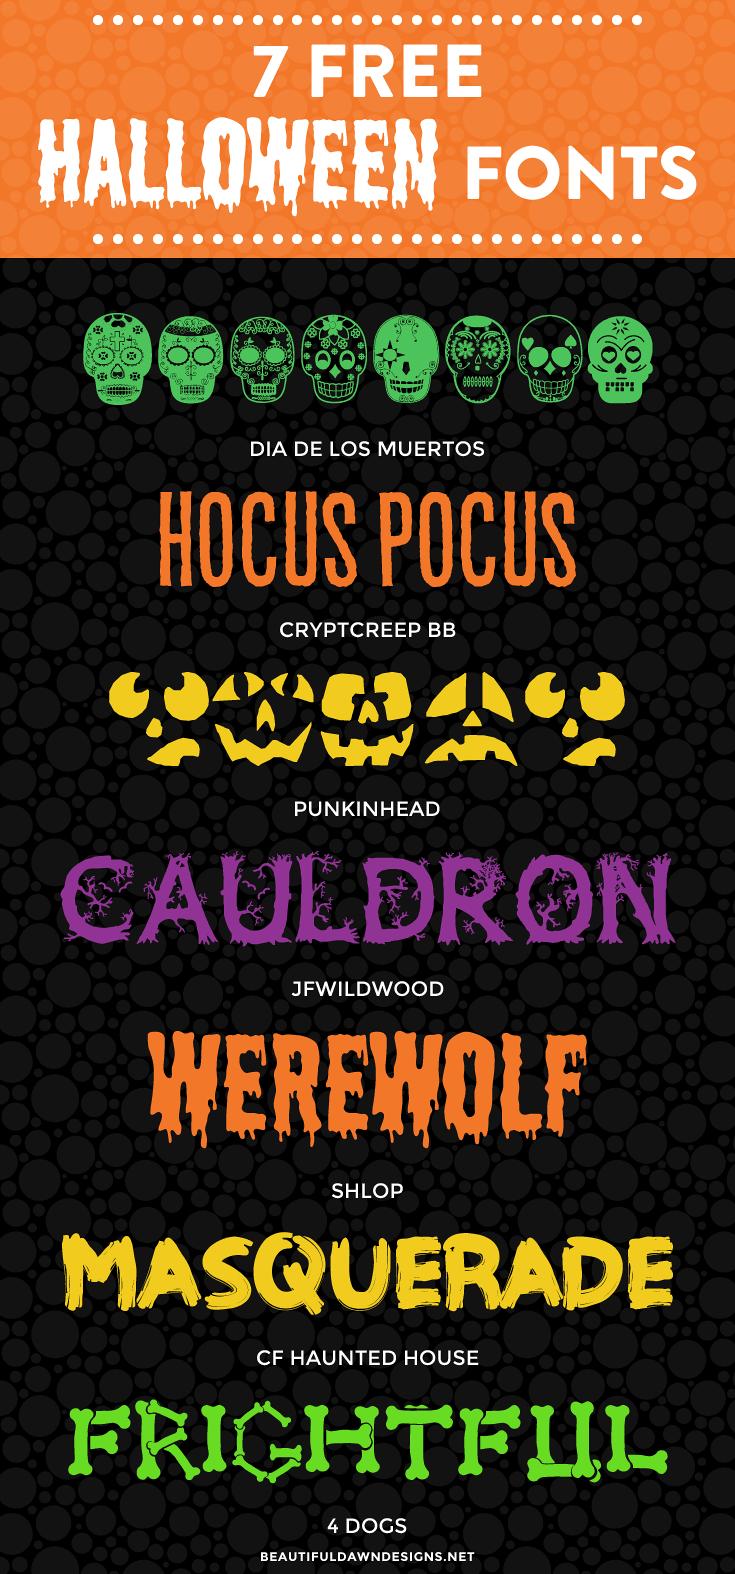 7 free halloween fonts | design inspiration | pinterest | halloween